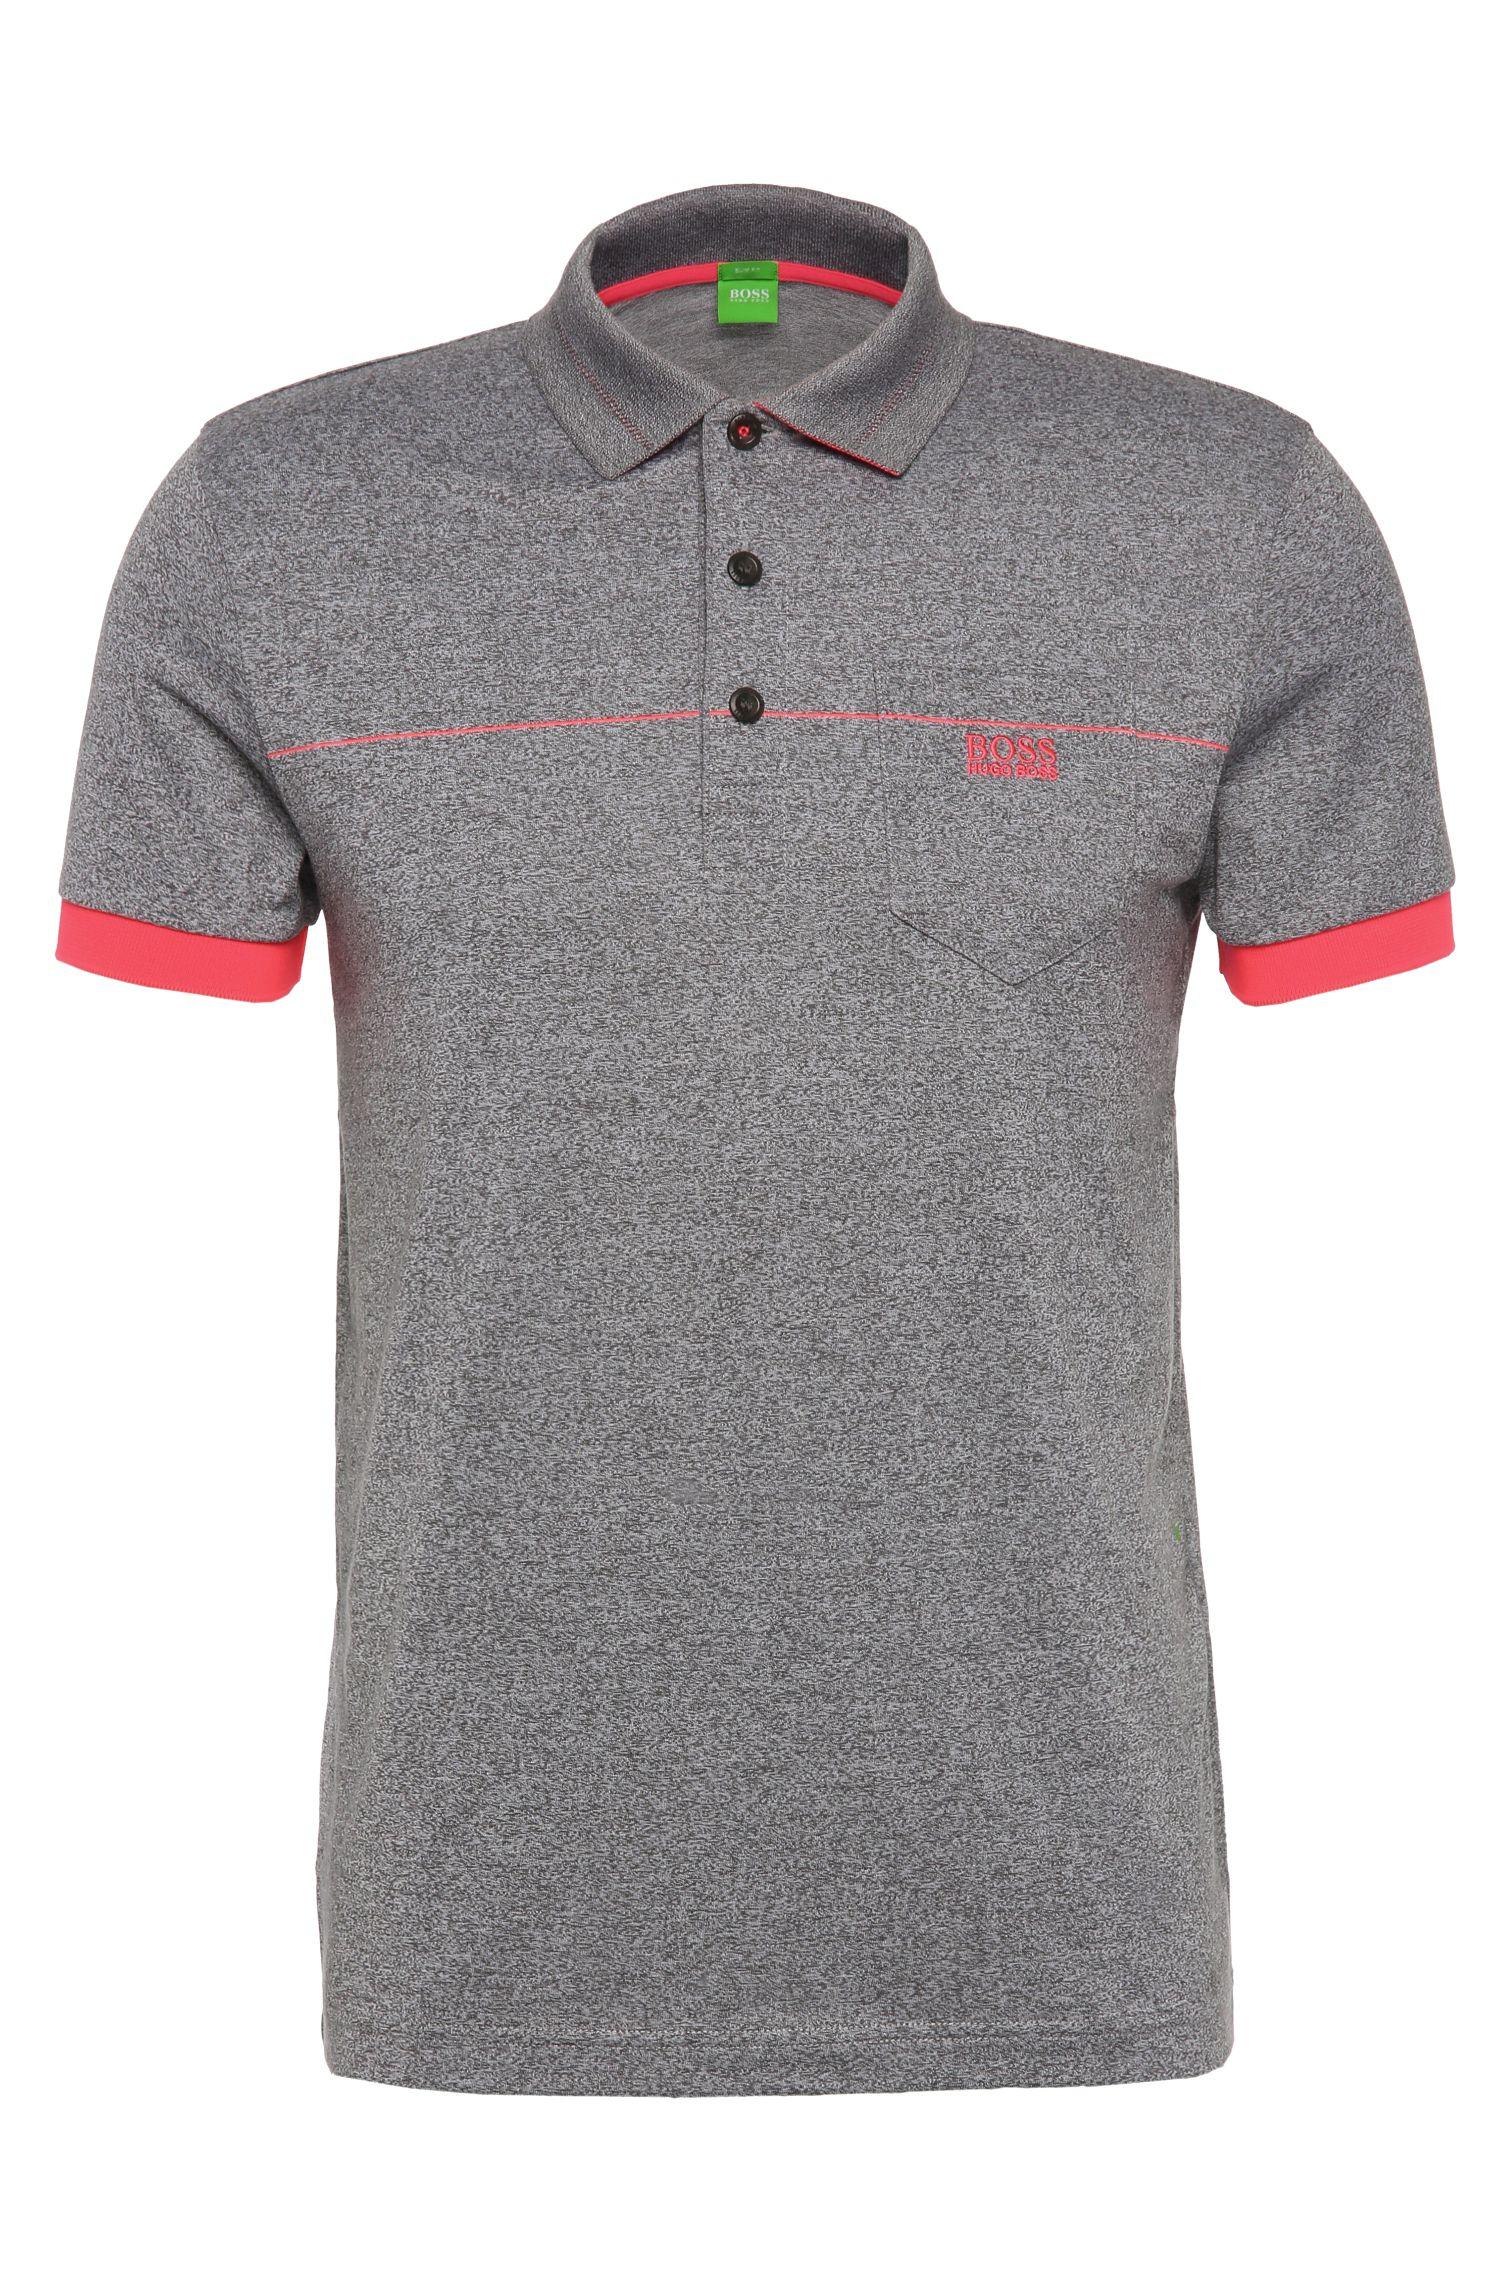 'Paule' | Cotton Blend Melange Polo Shirt